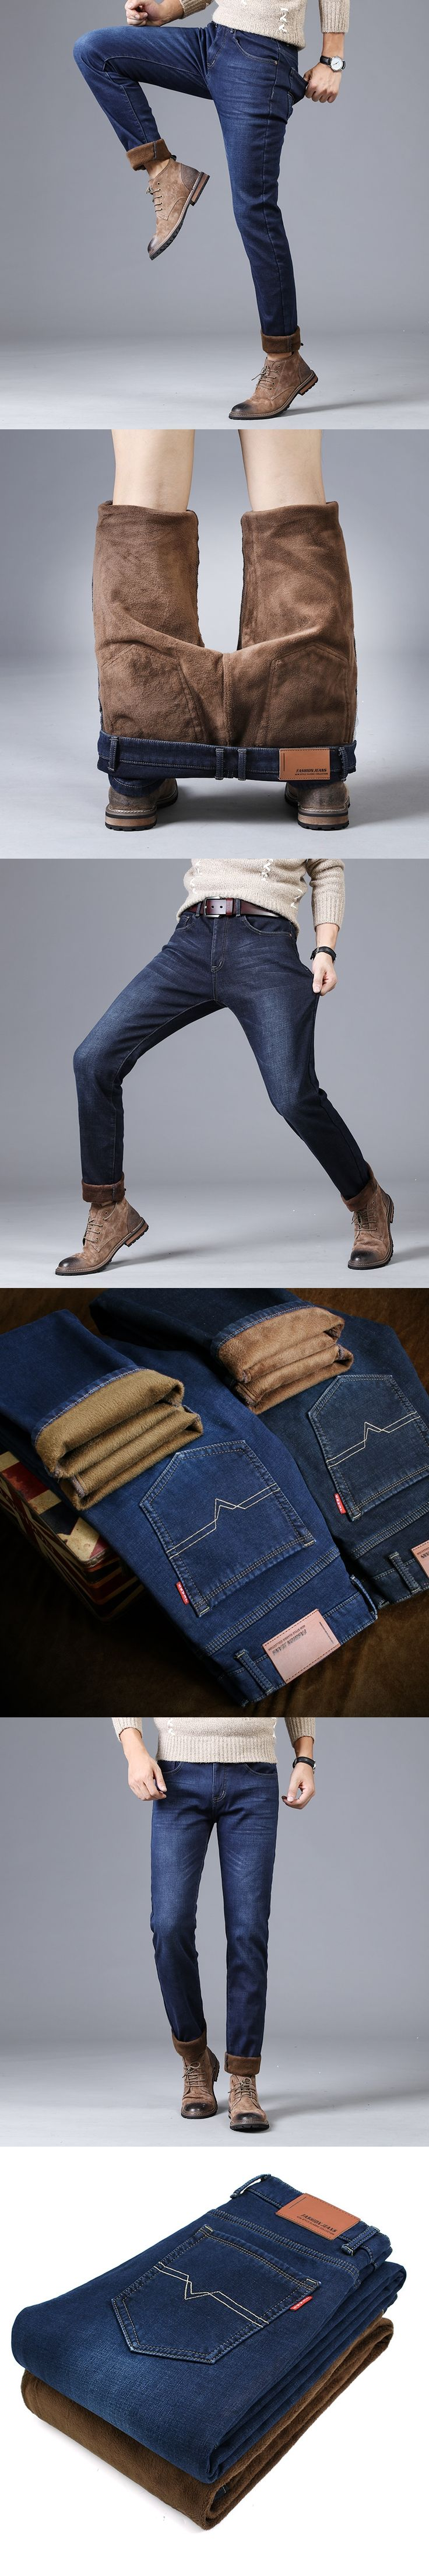 2017 Winter Mens Stretch Jeans Warm Fleece Flannel Lined Quality Denim Jean Pants Size 28-40 Brand Black Blue Jeans for Mens